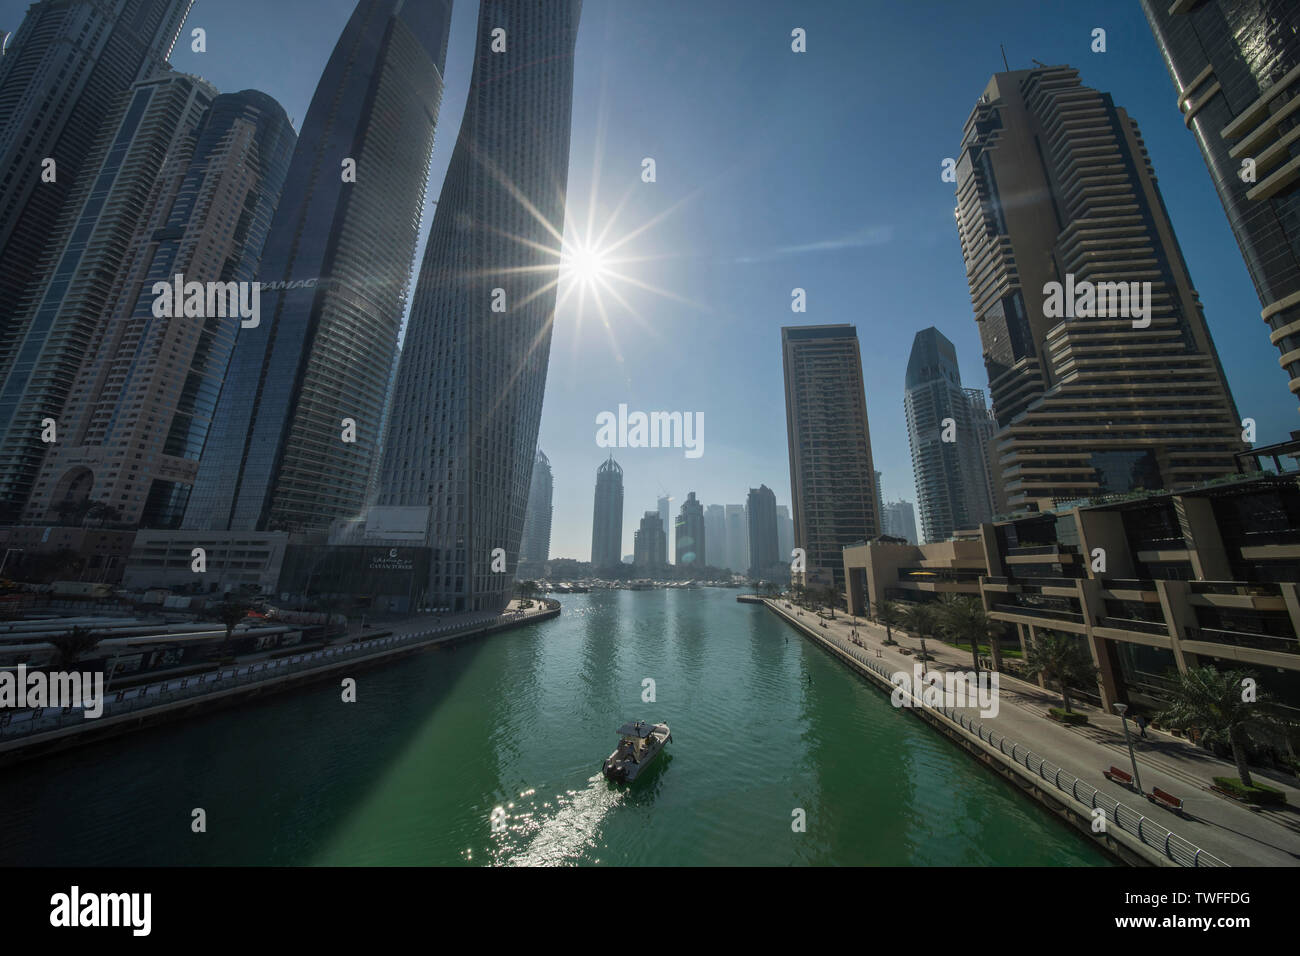 The sun coming up over the Dubai streams light into the marina. - Stock Image